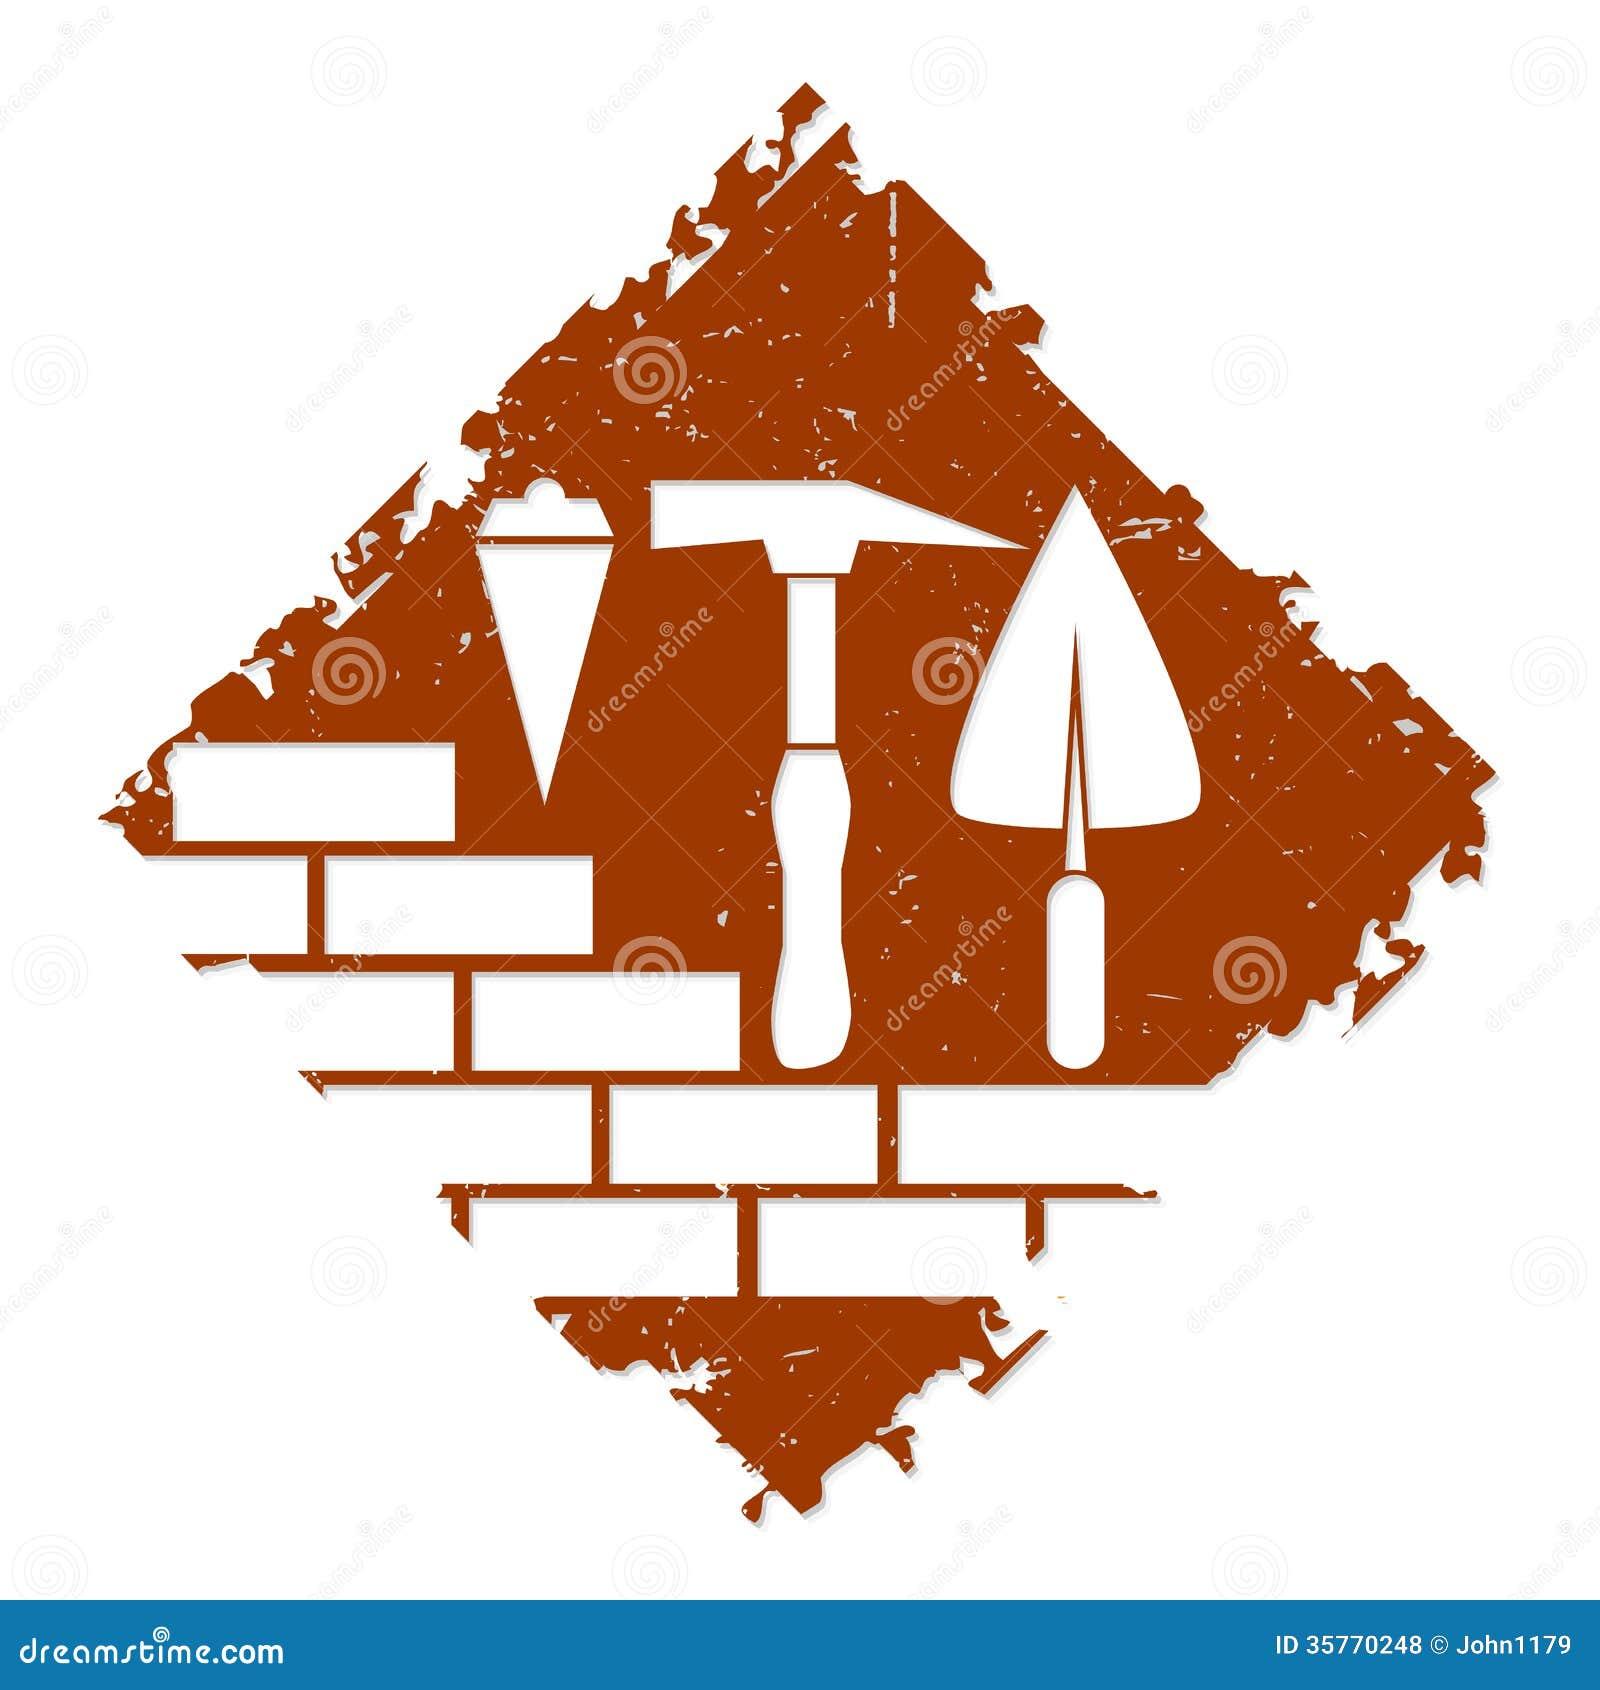 Construction symbol design royalty free stock photos for Design construction